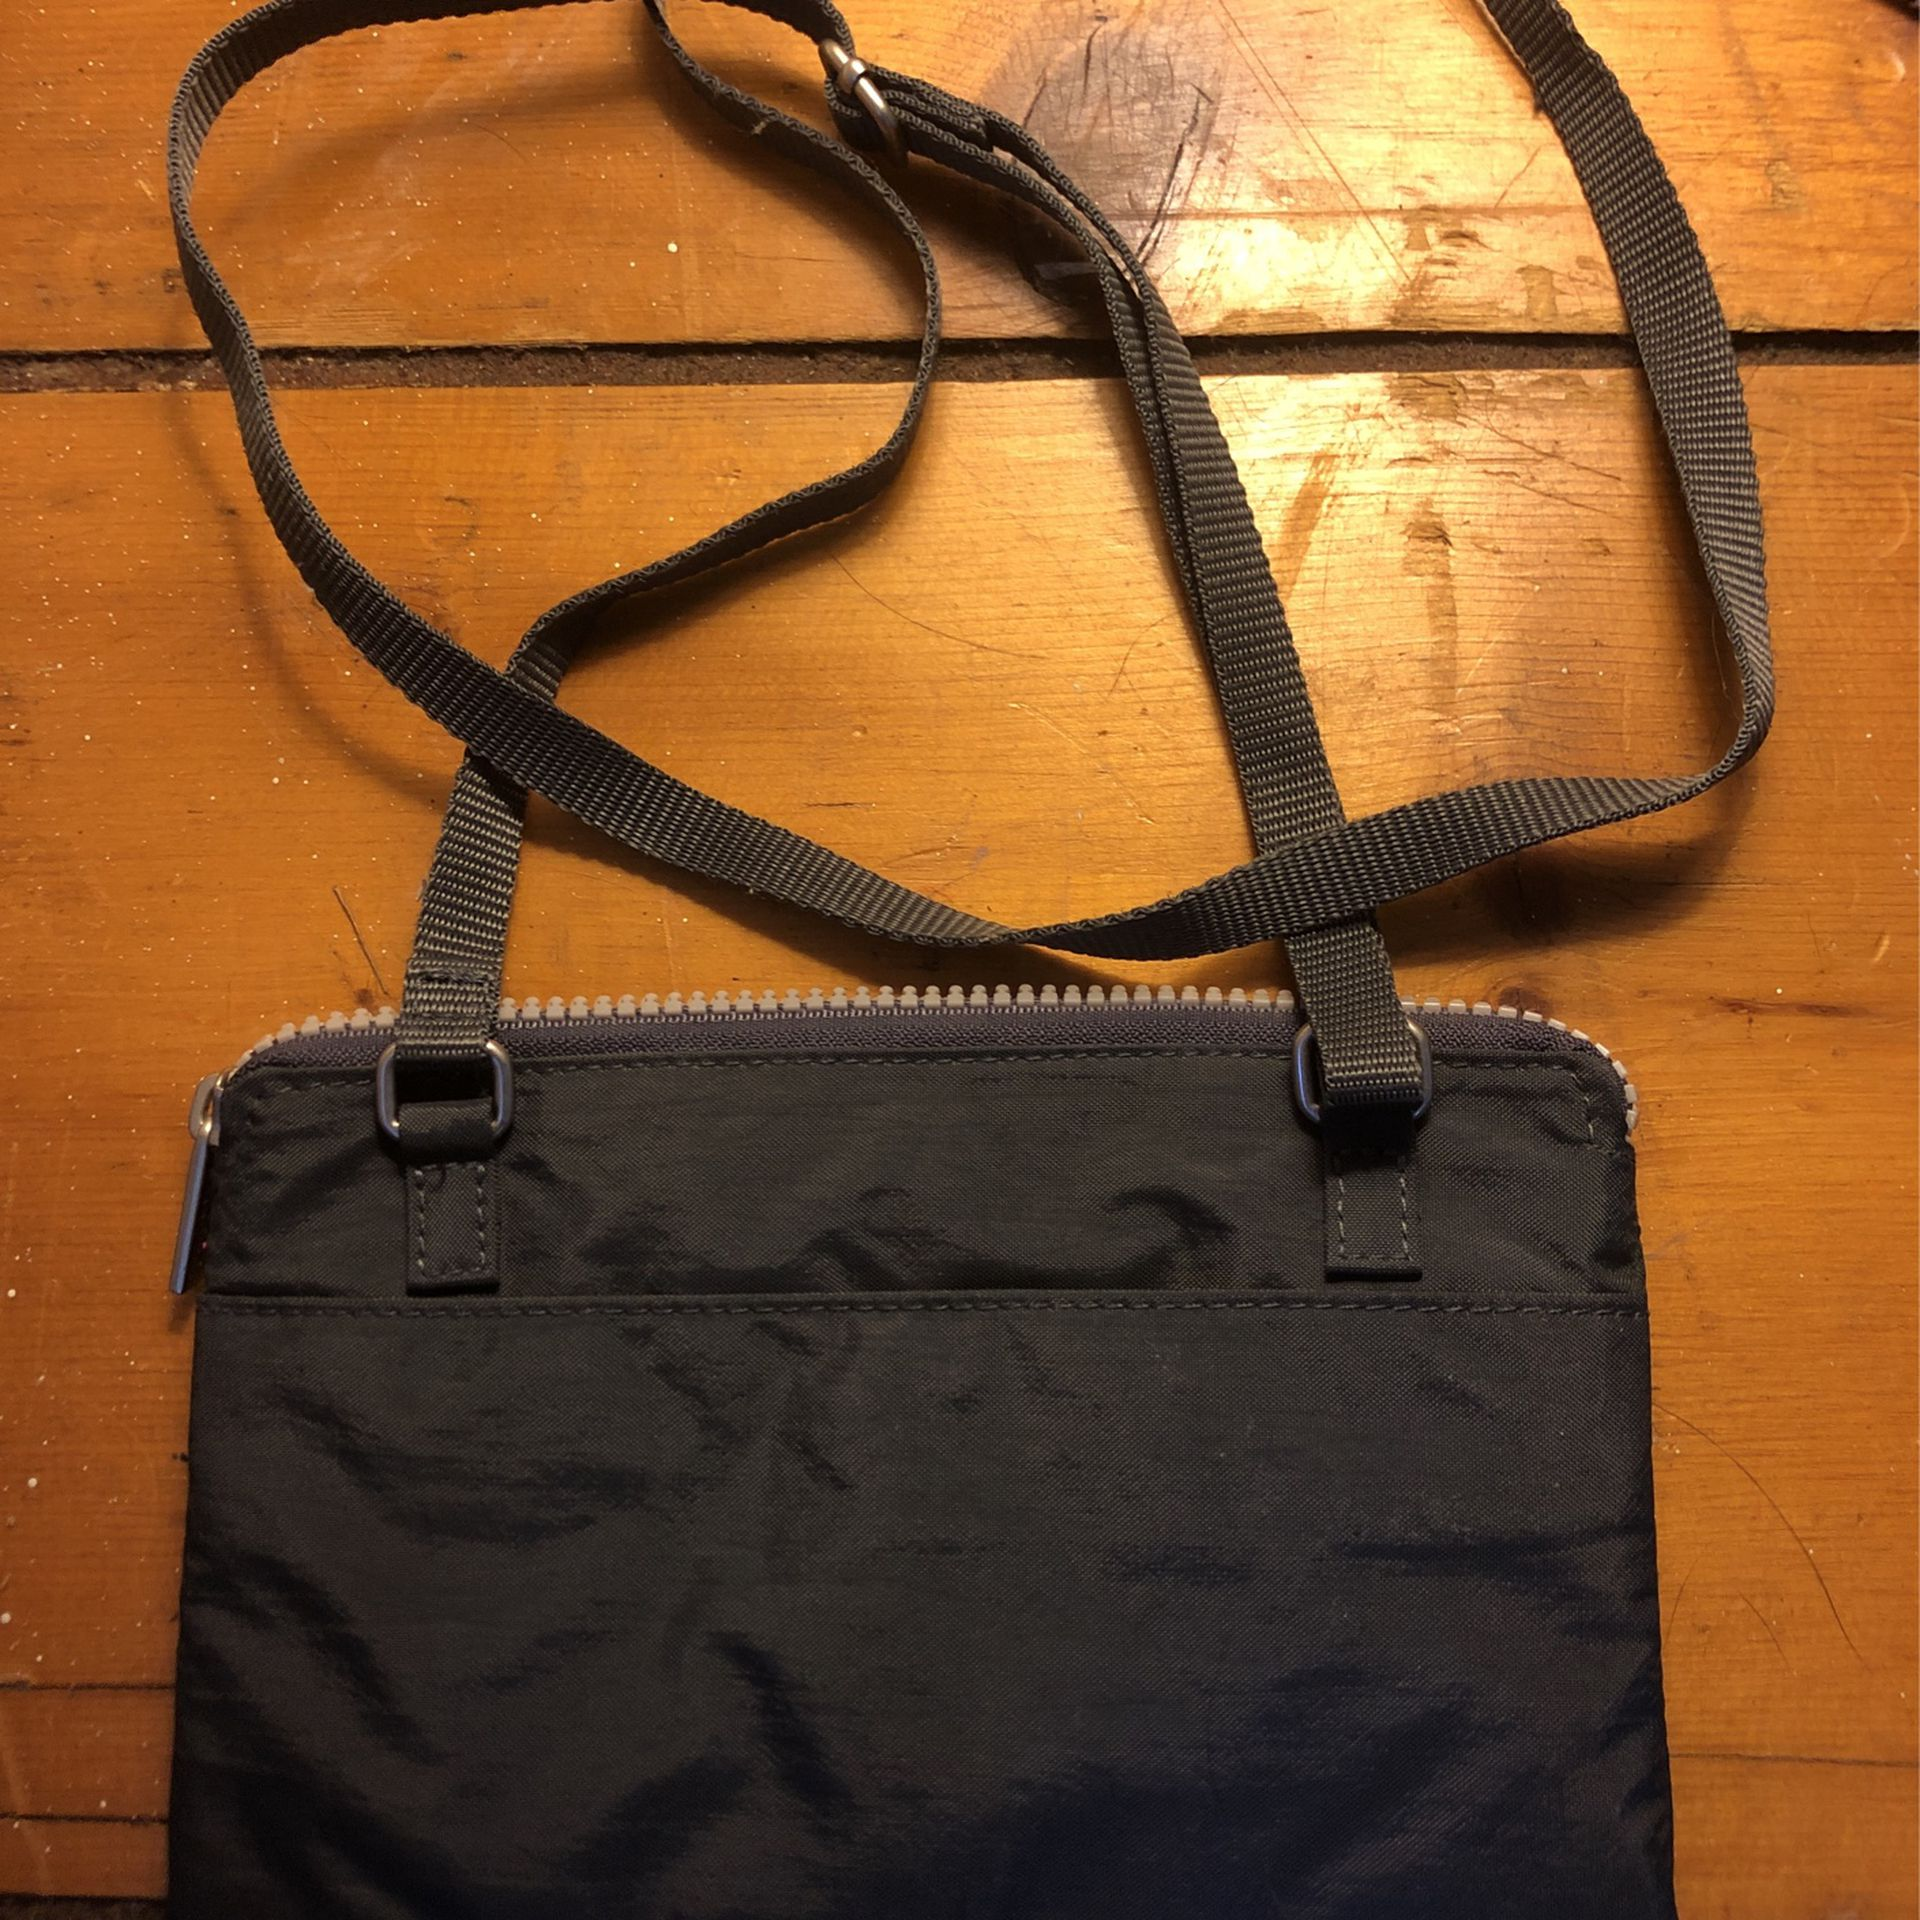 Gray Baggallini 3 zipper small crossbody bag